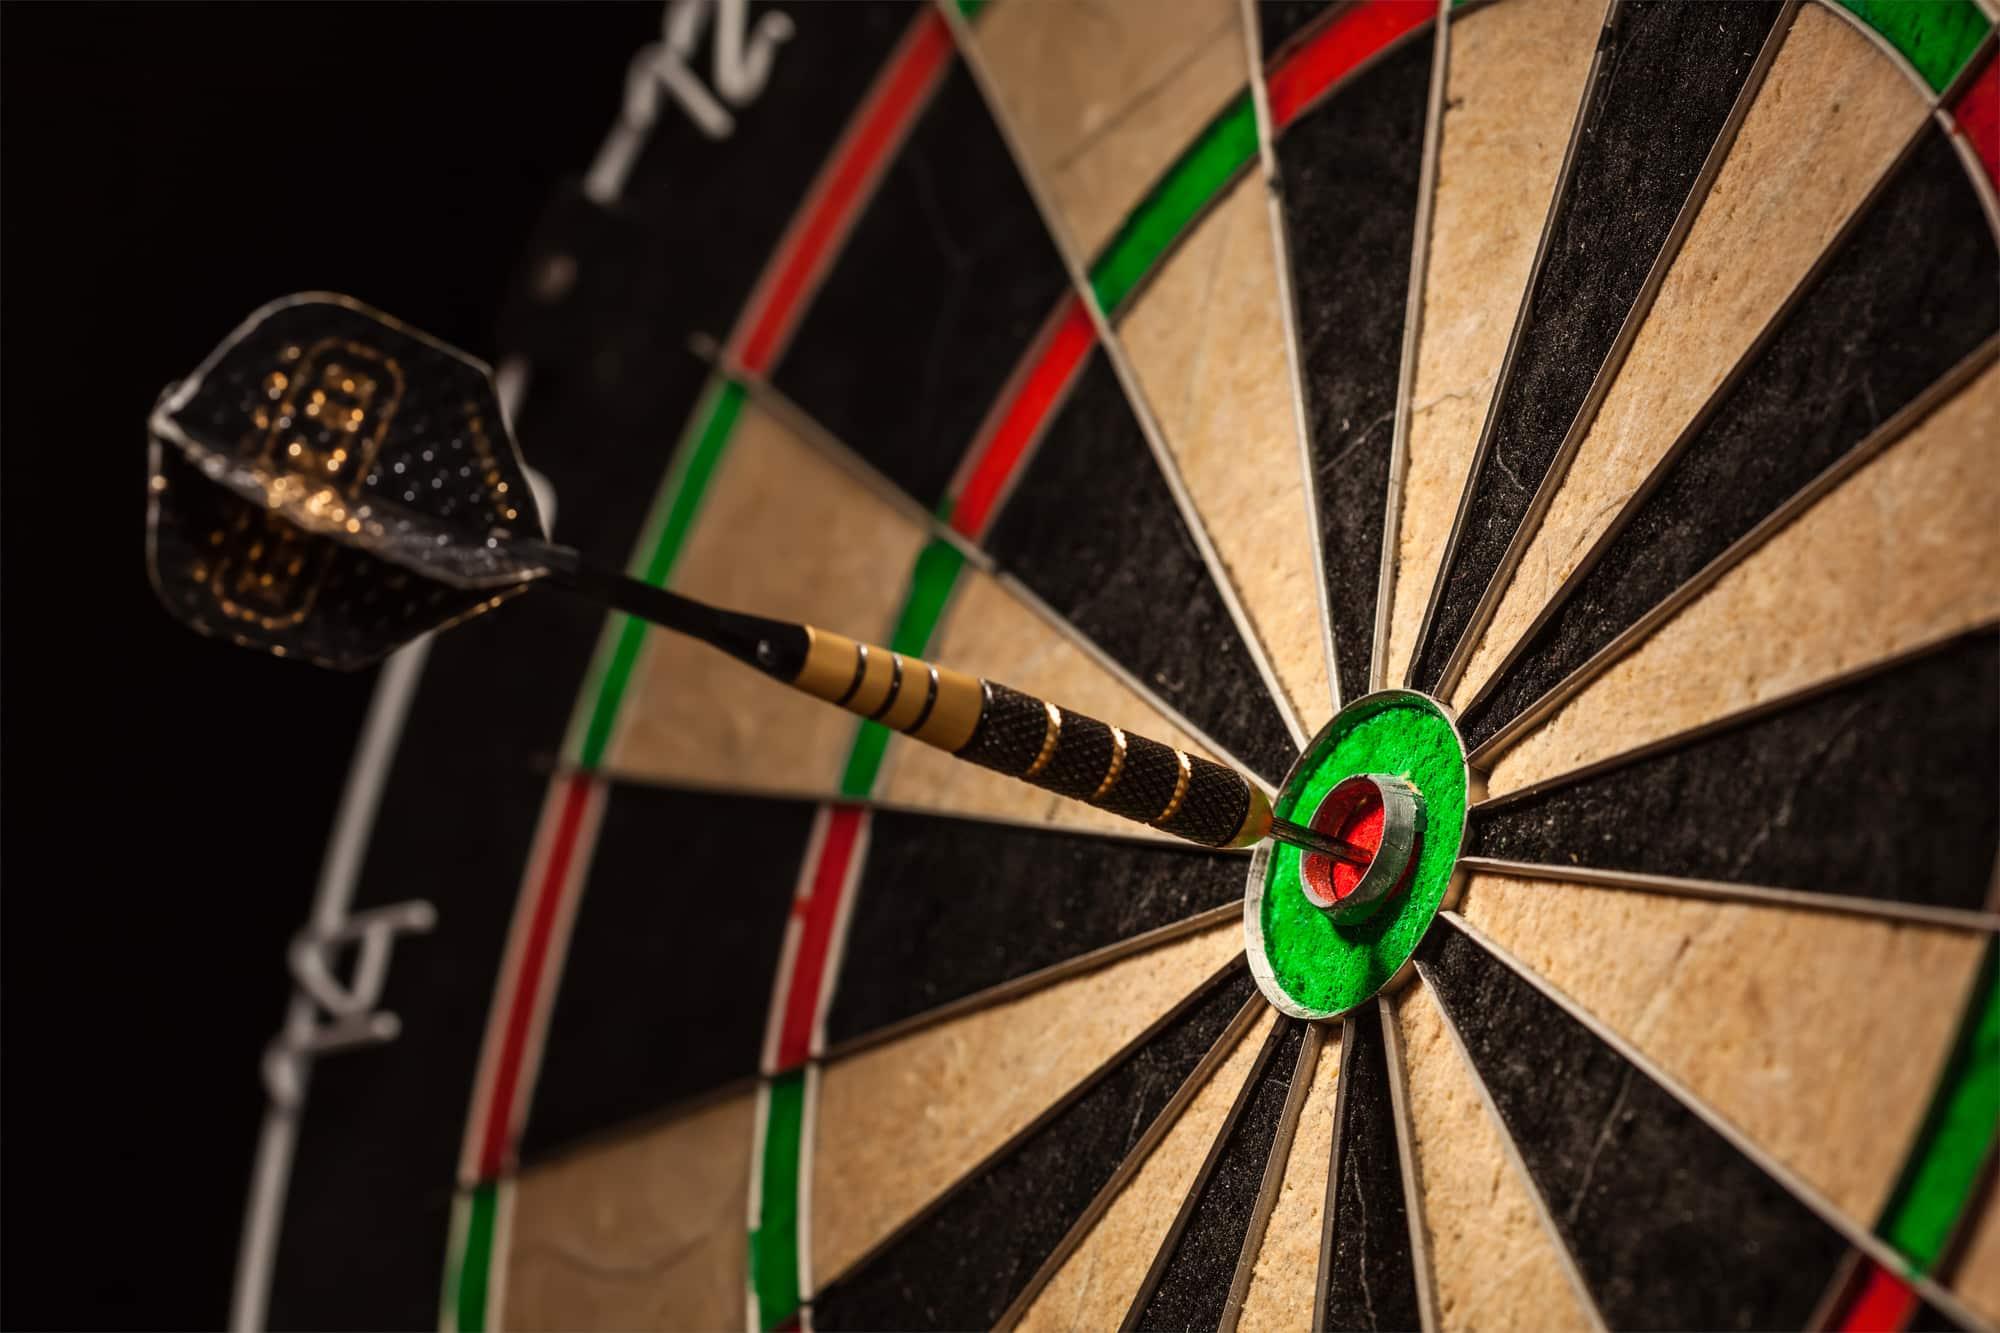 World Darts Acca Bonus - Up To £50 Free Bet on Winning bets at Quinnbet